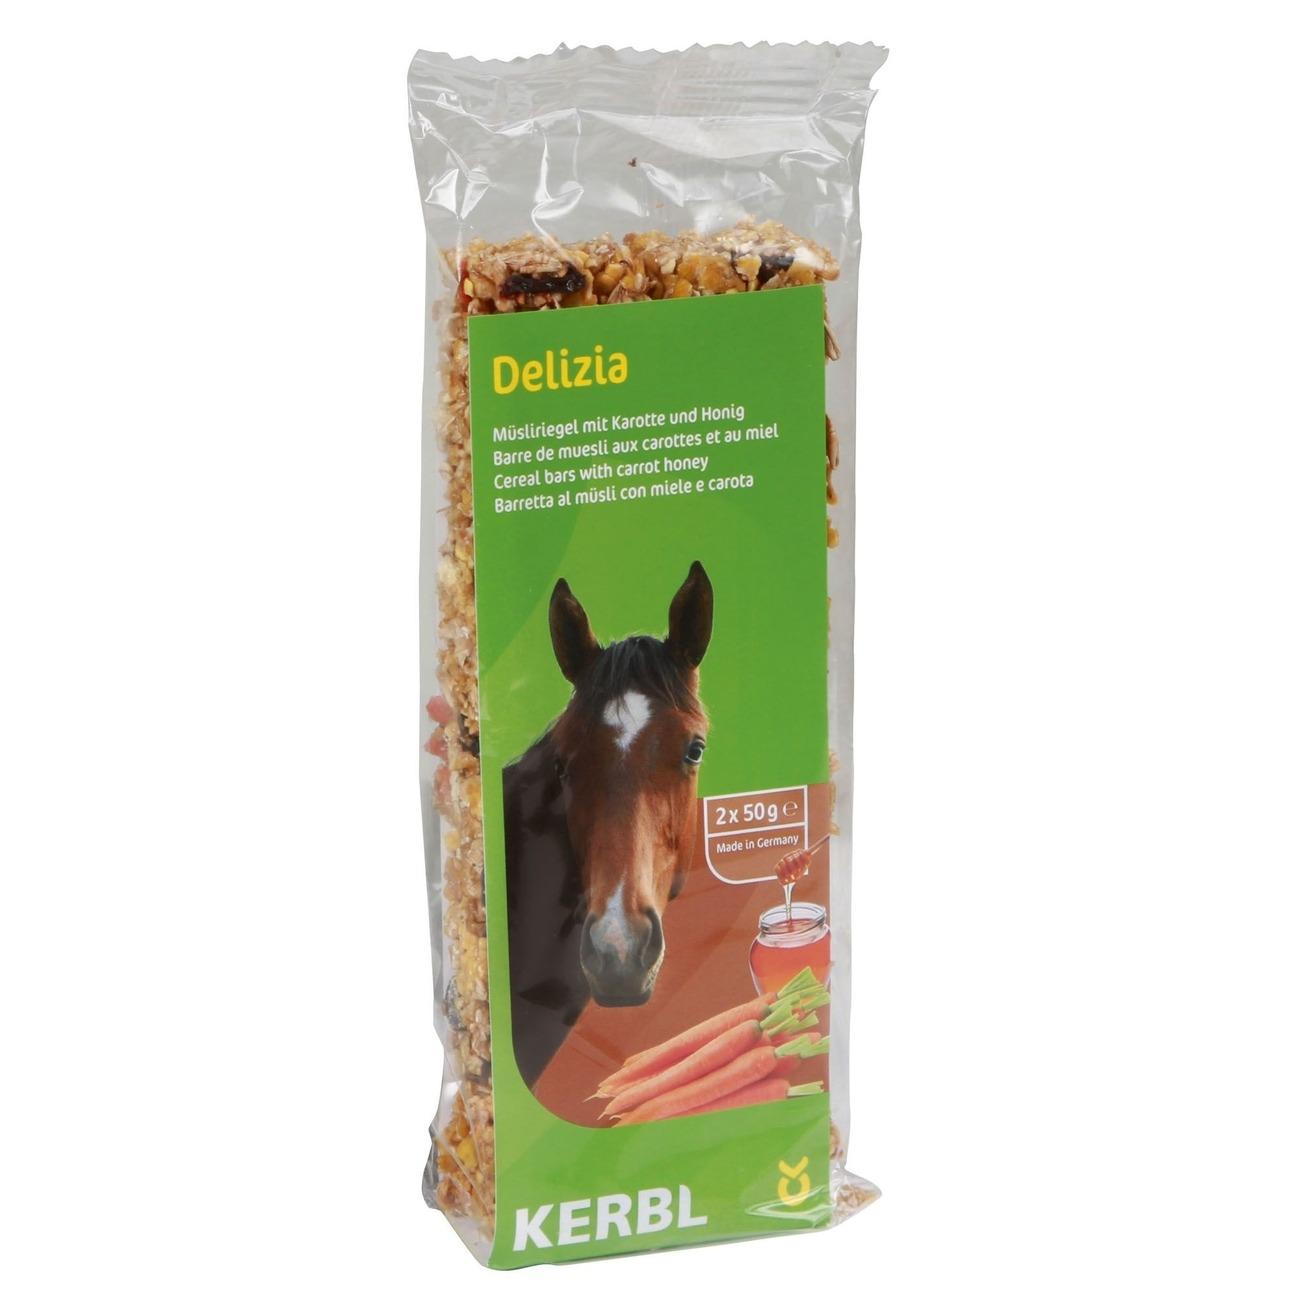 Kerbl Delizia Müsliriegel für Pferde